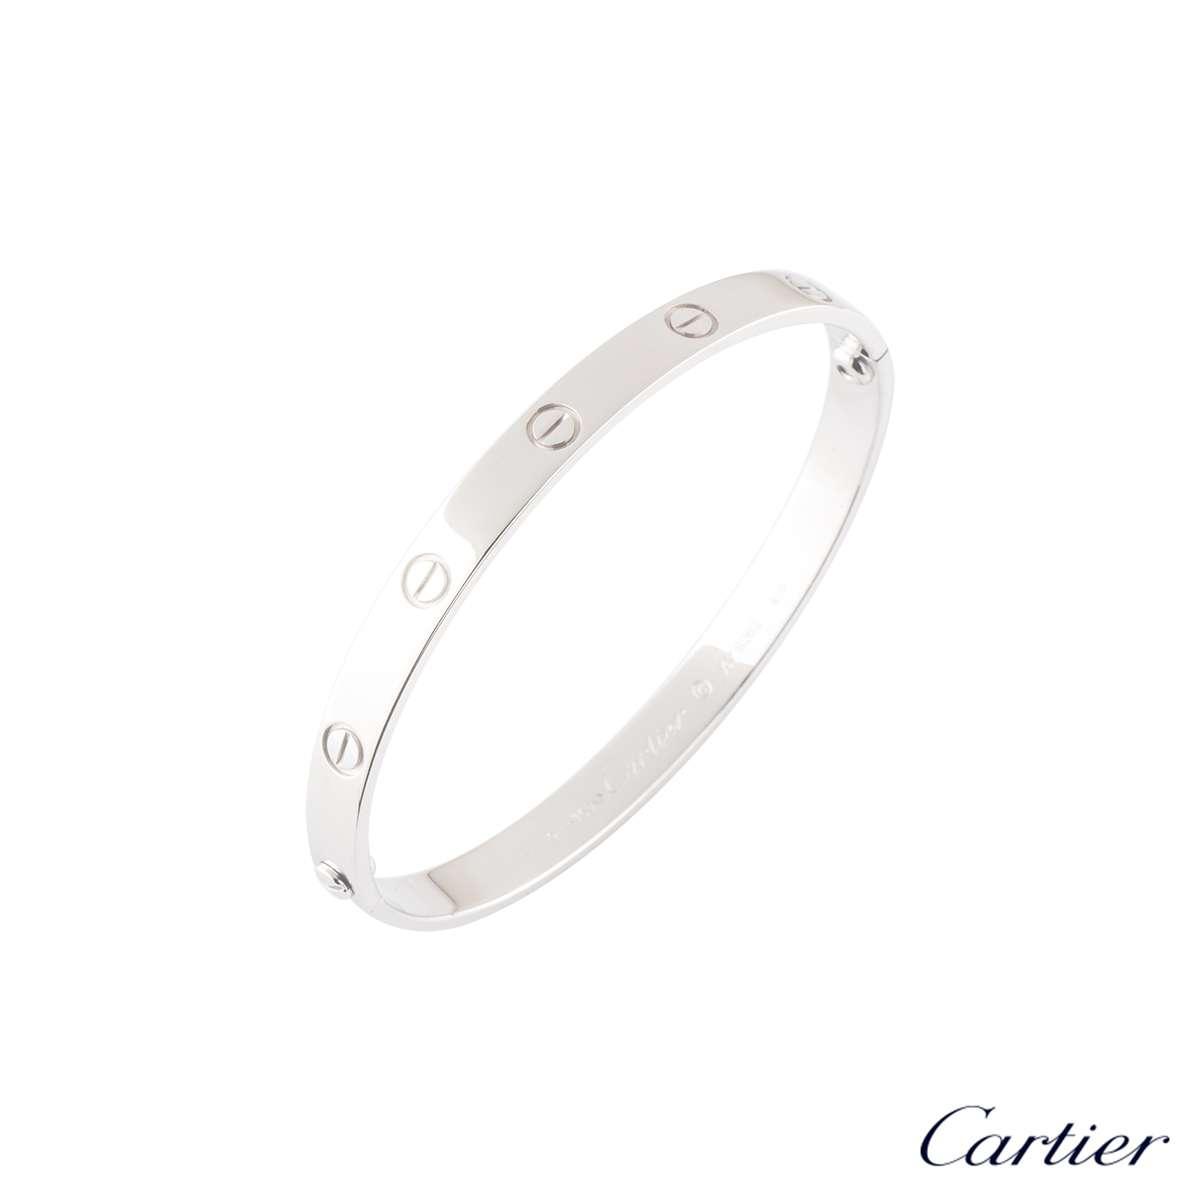 CartierWhite Gold Love Bracelet Size 19B6035419